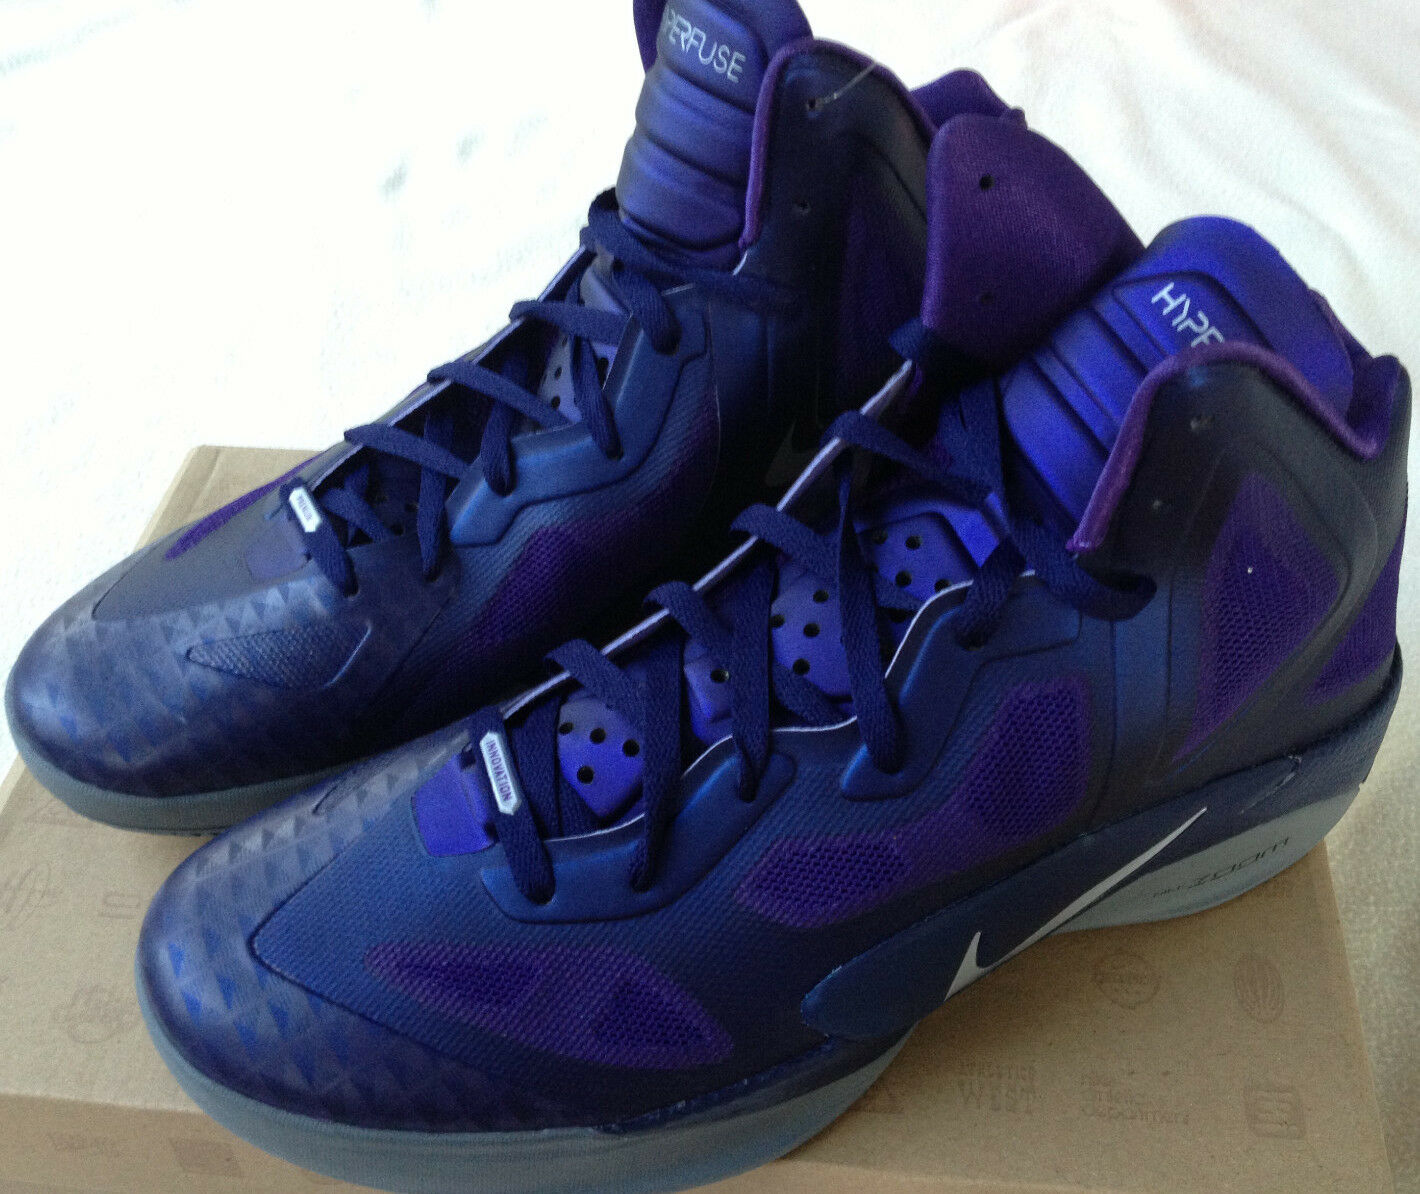 Nuove da nike air zoom hyperfuse 469757-500 viola gray scarpe da Nuove basket nba uomini '13 4cad50